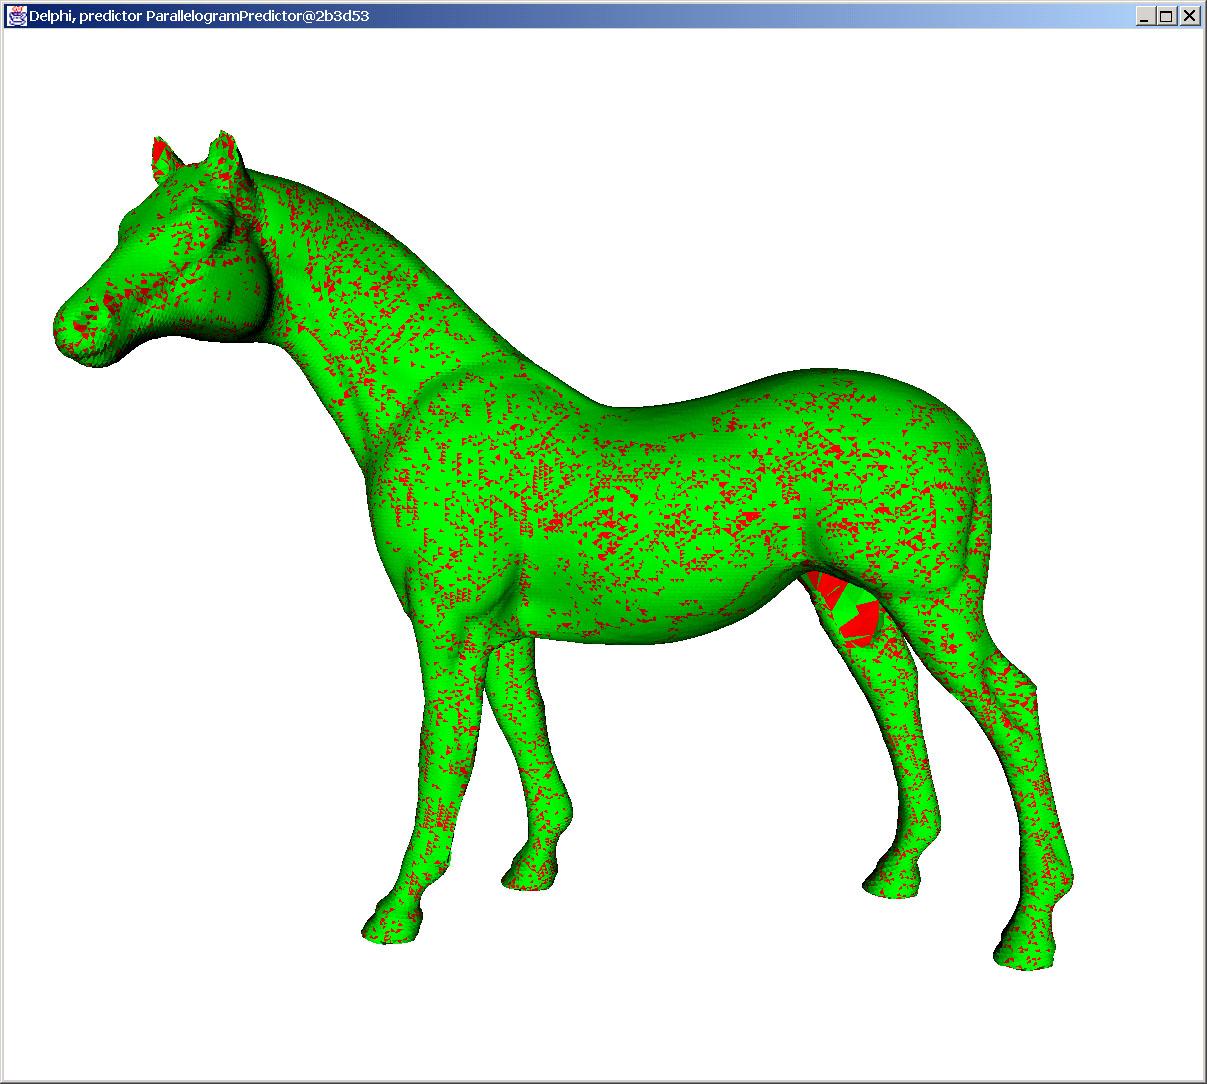 Modell Pferd mit Delphi Kompression kodiert.